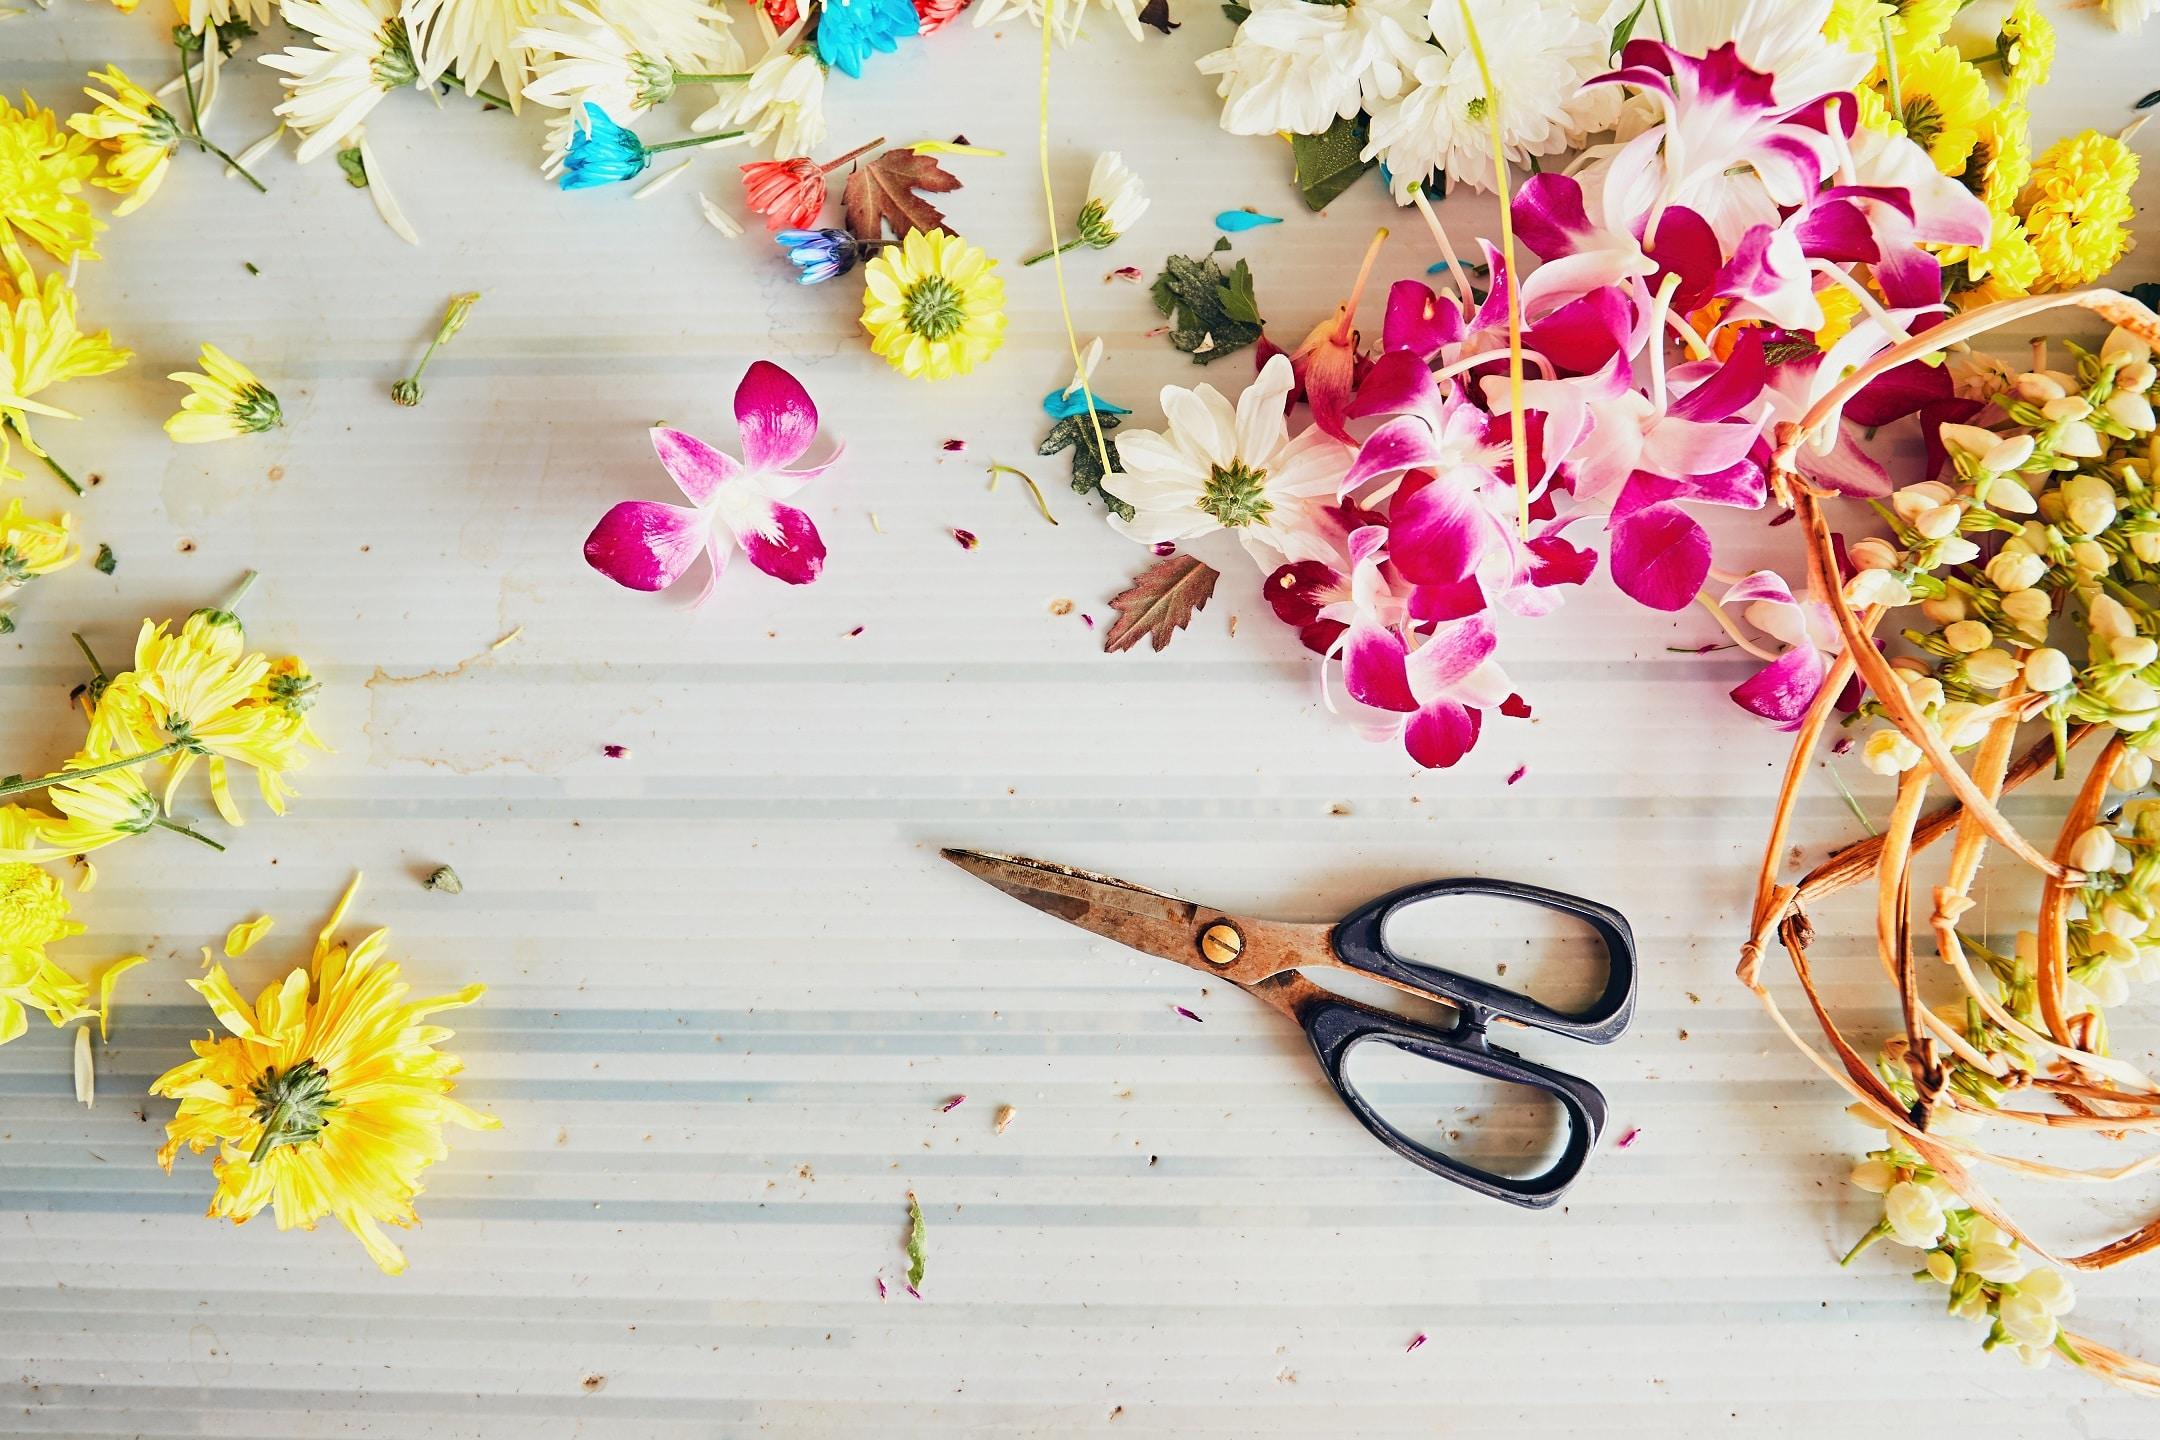 Cvetličarna Omers - Scissors in flower shop